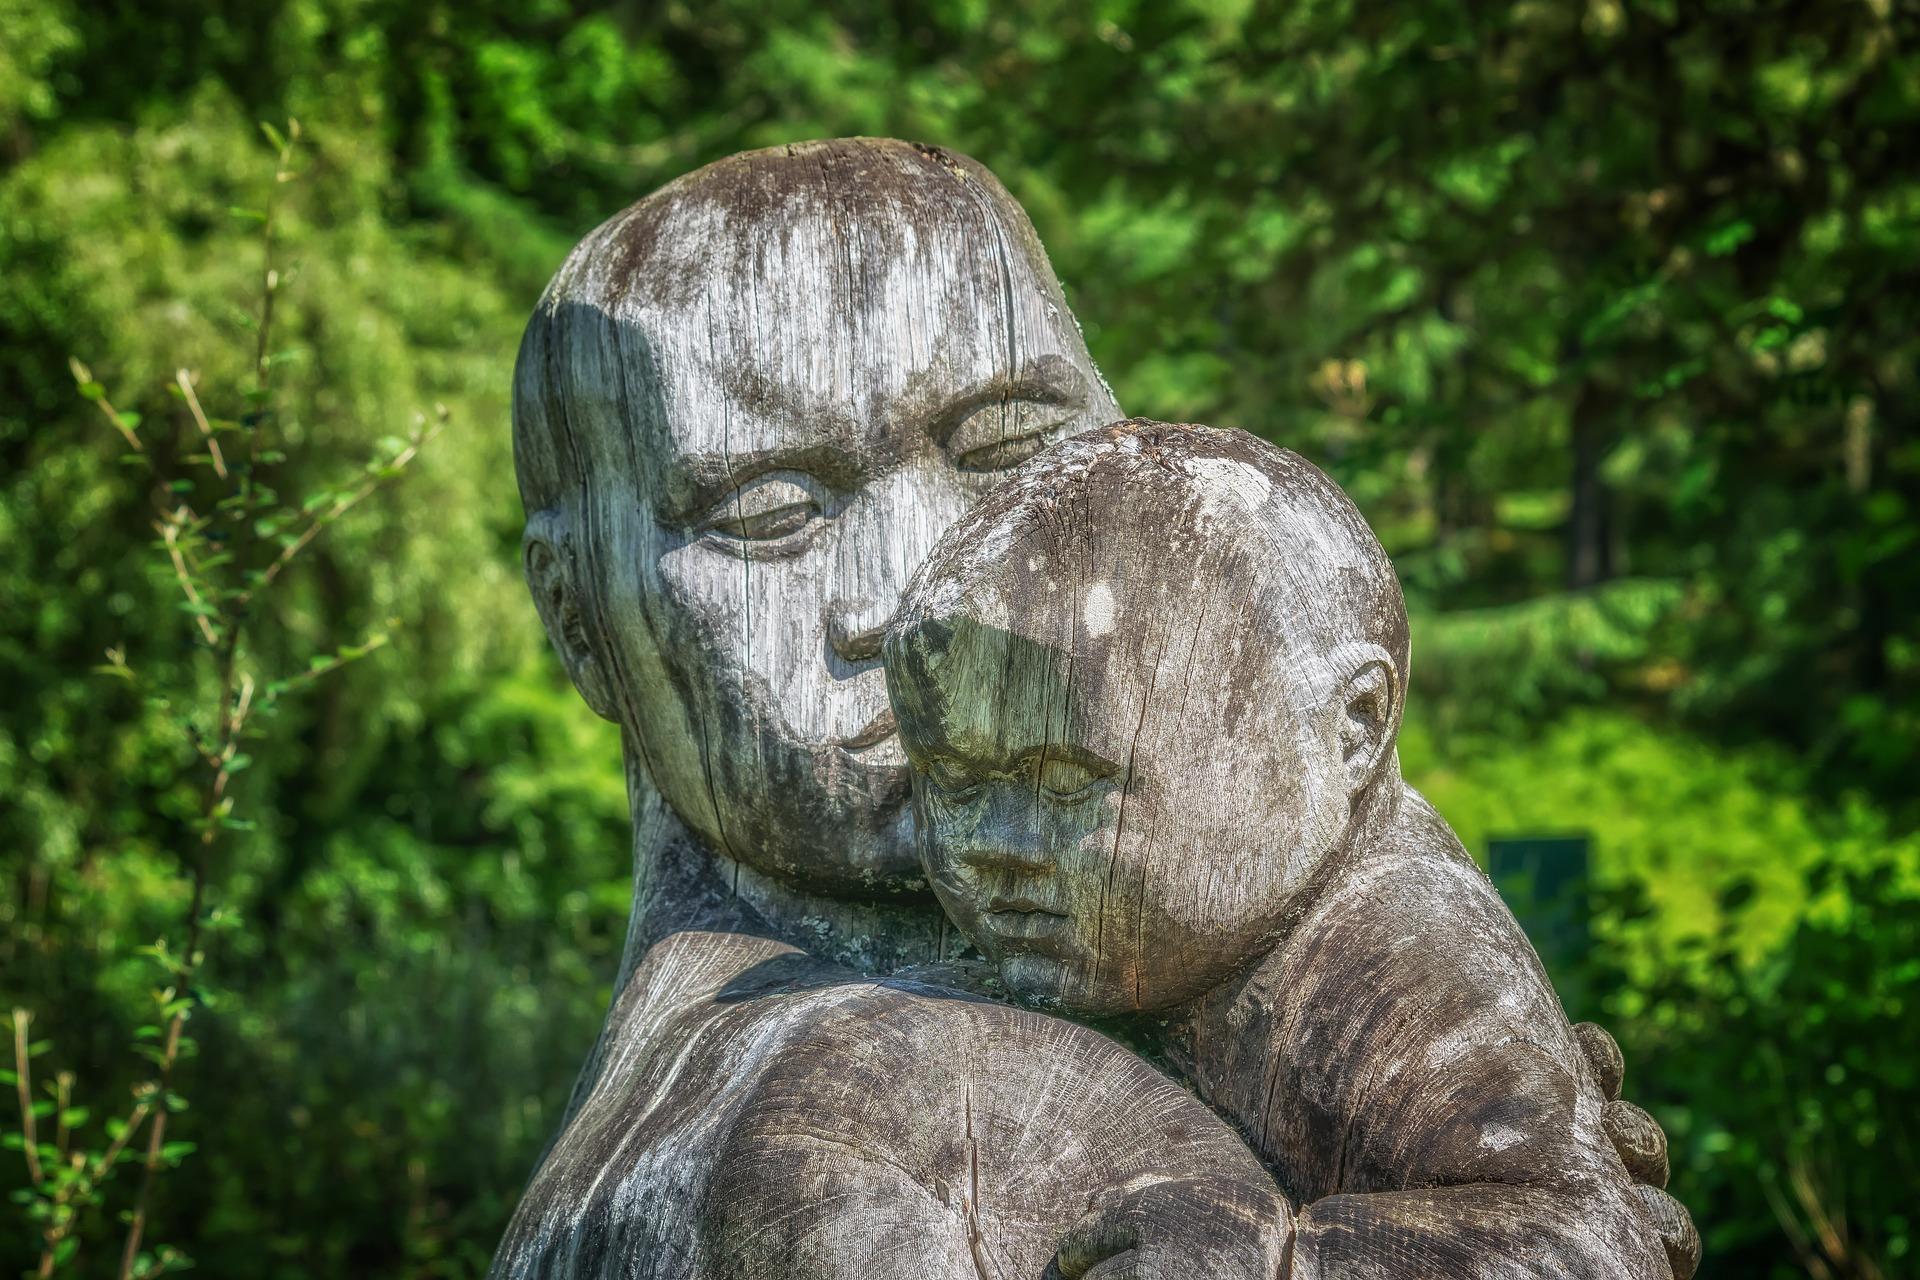 sculpture-2406078_1920